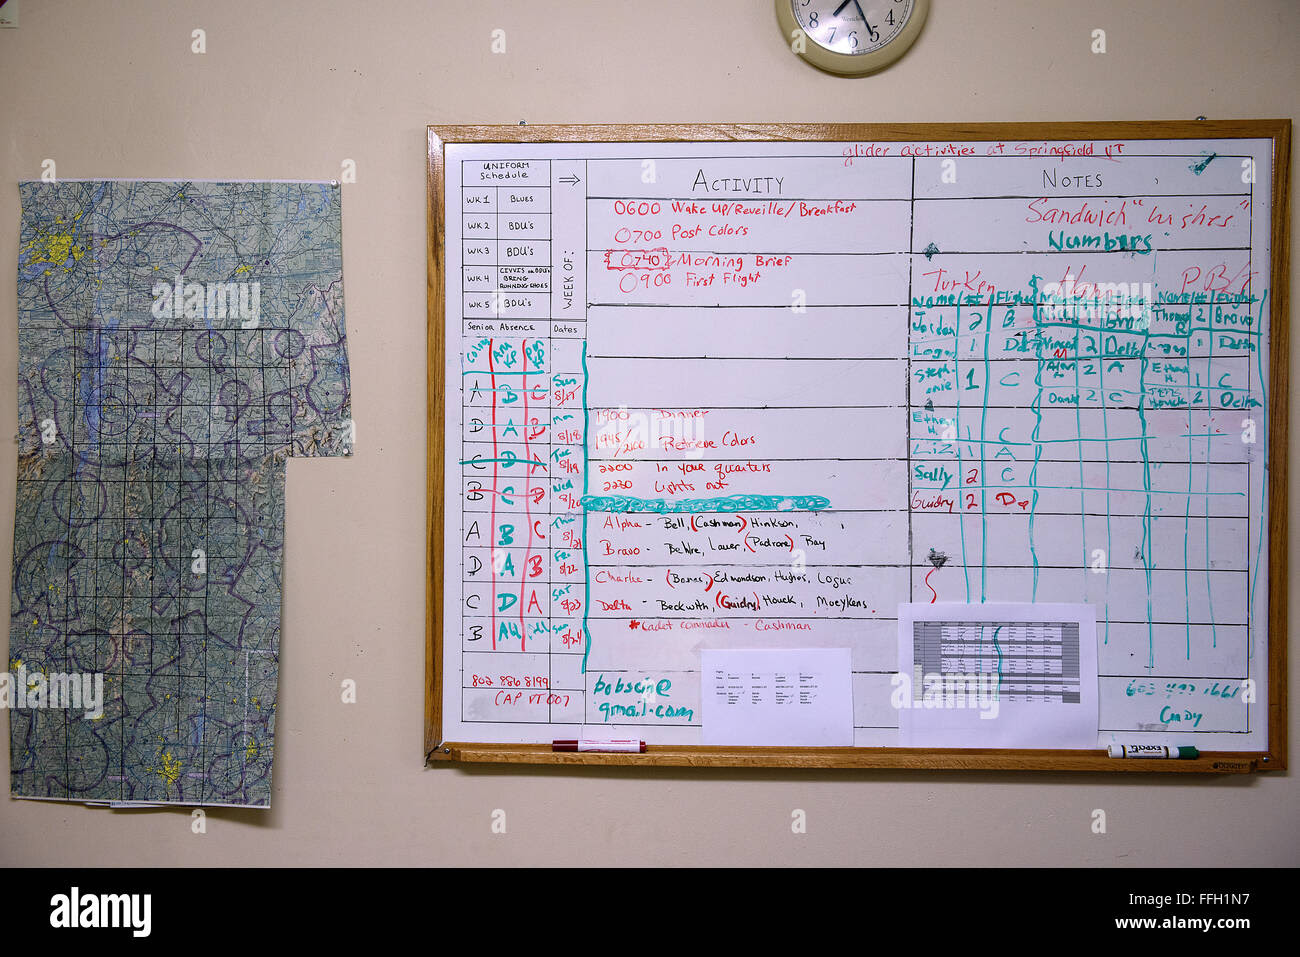 Daily Schedule Dry Erase Board | Daily Agenda Calendar